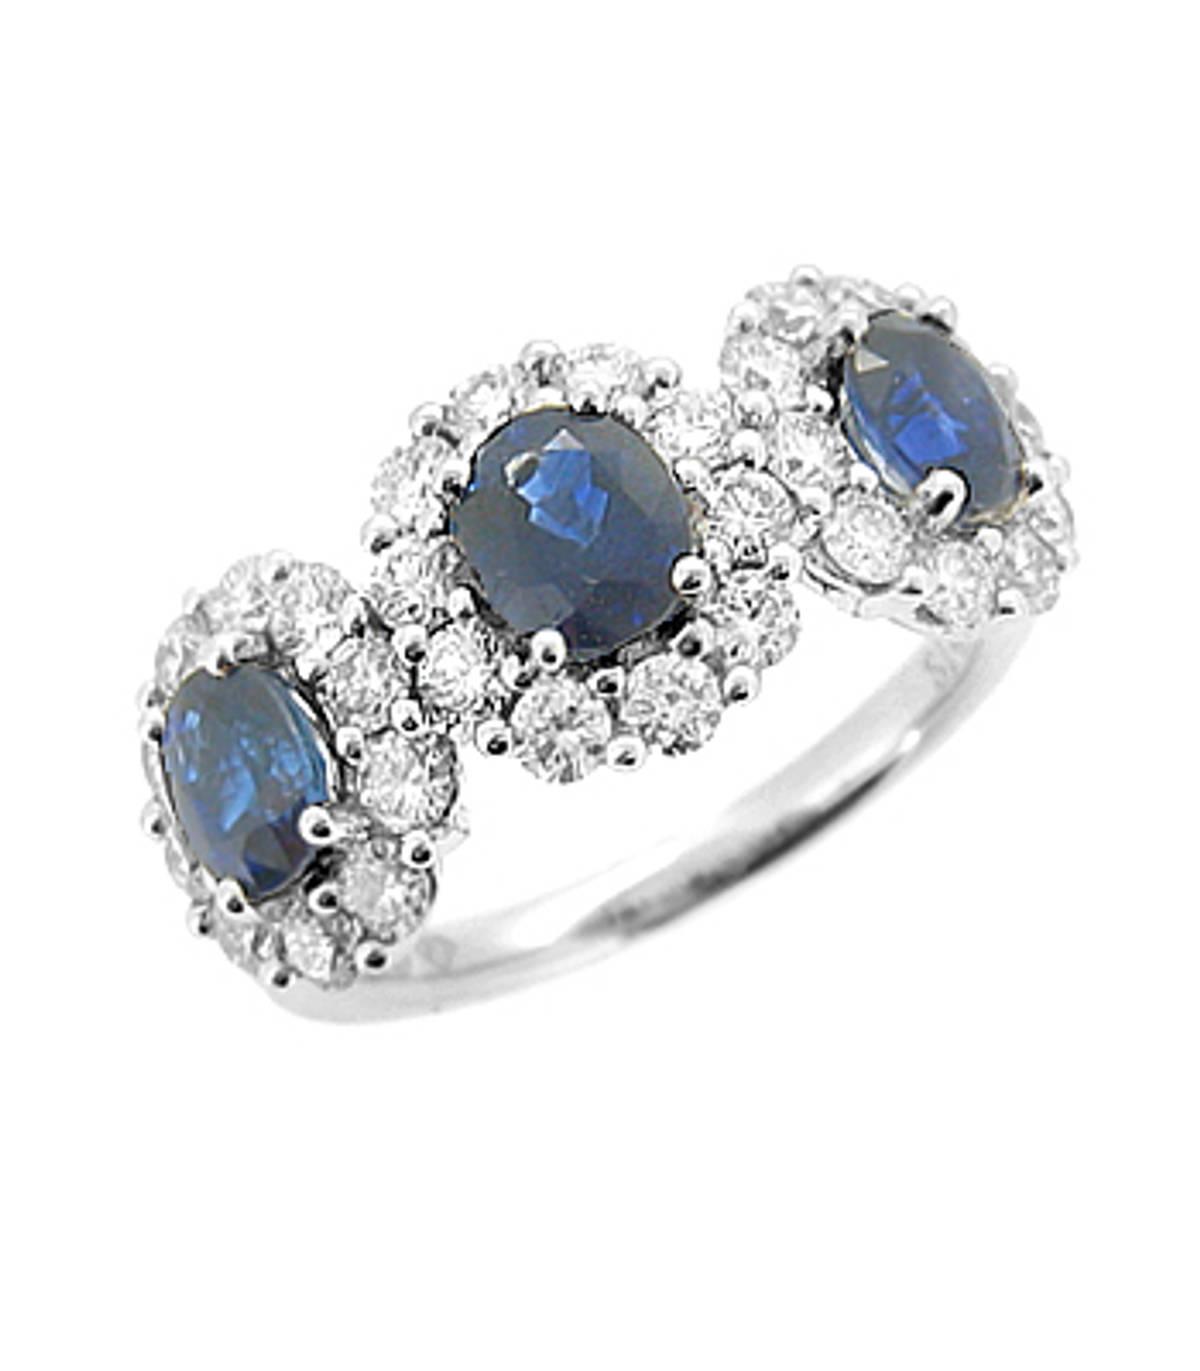 Sapphire and diamond treble cluster ringPictured item: sapphire: total 1.45ct/diamonds: total 1.09ct set in 18k white gold